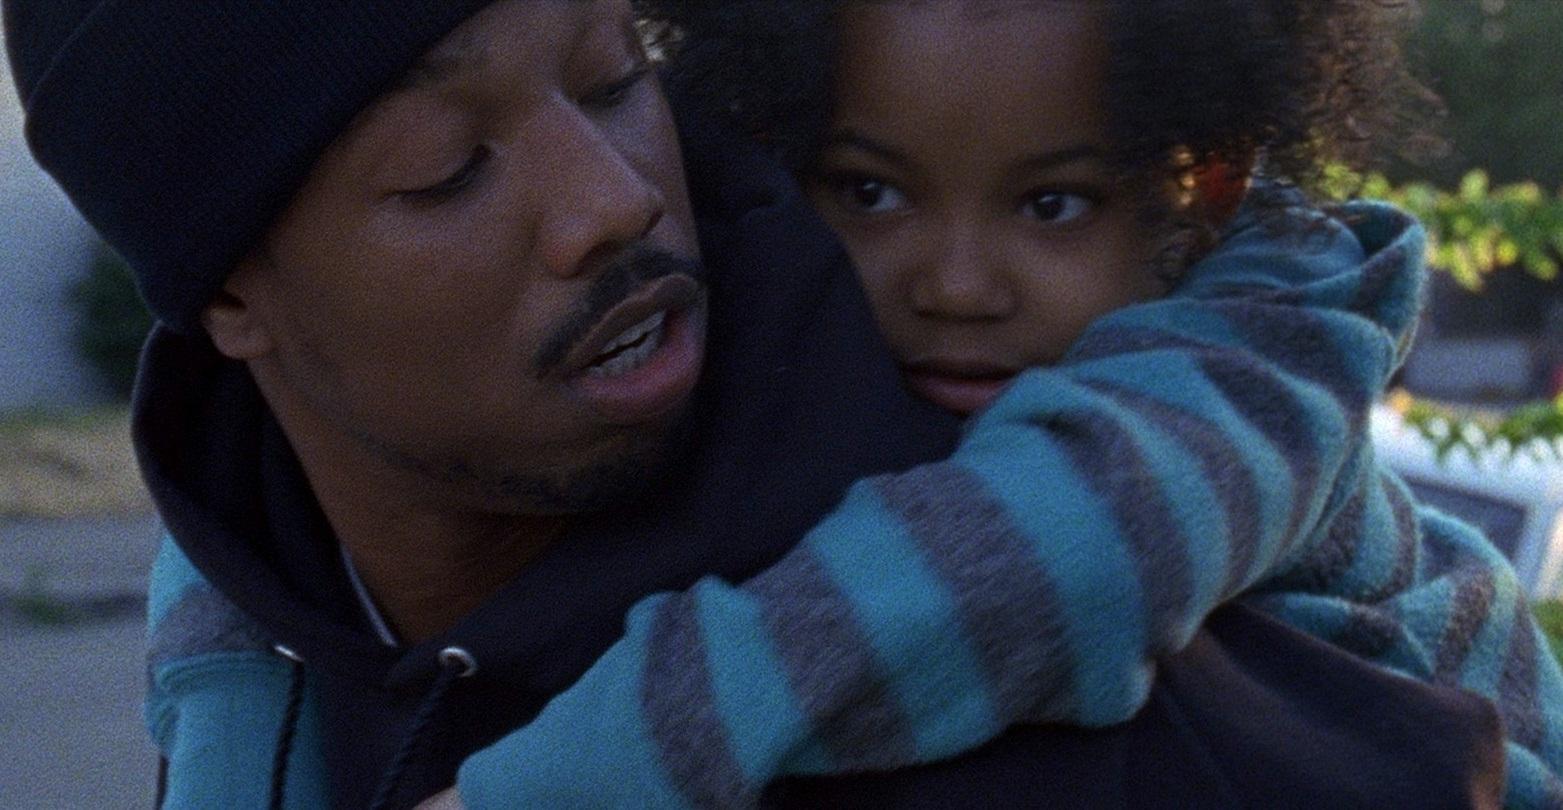 <i>Fruitvale</i> Gets Top Honors at 2013 Sundance